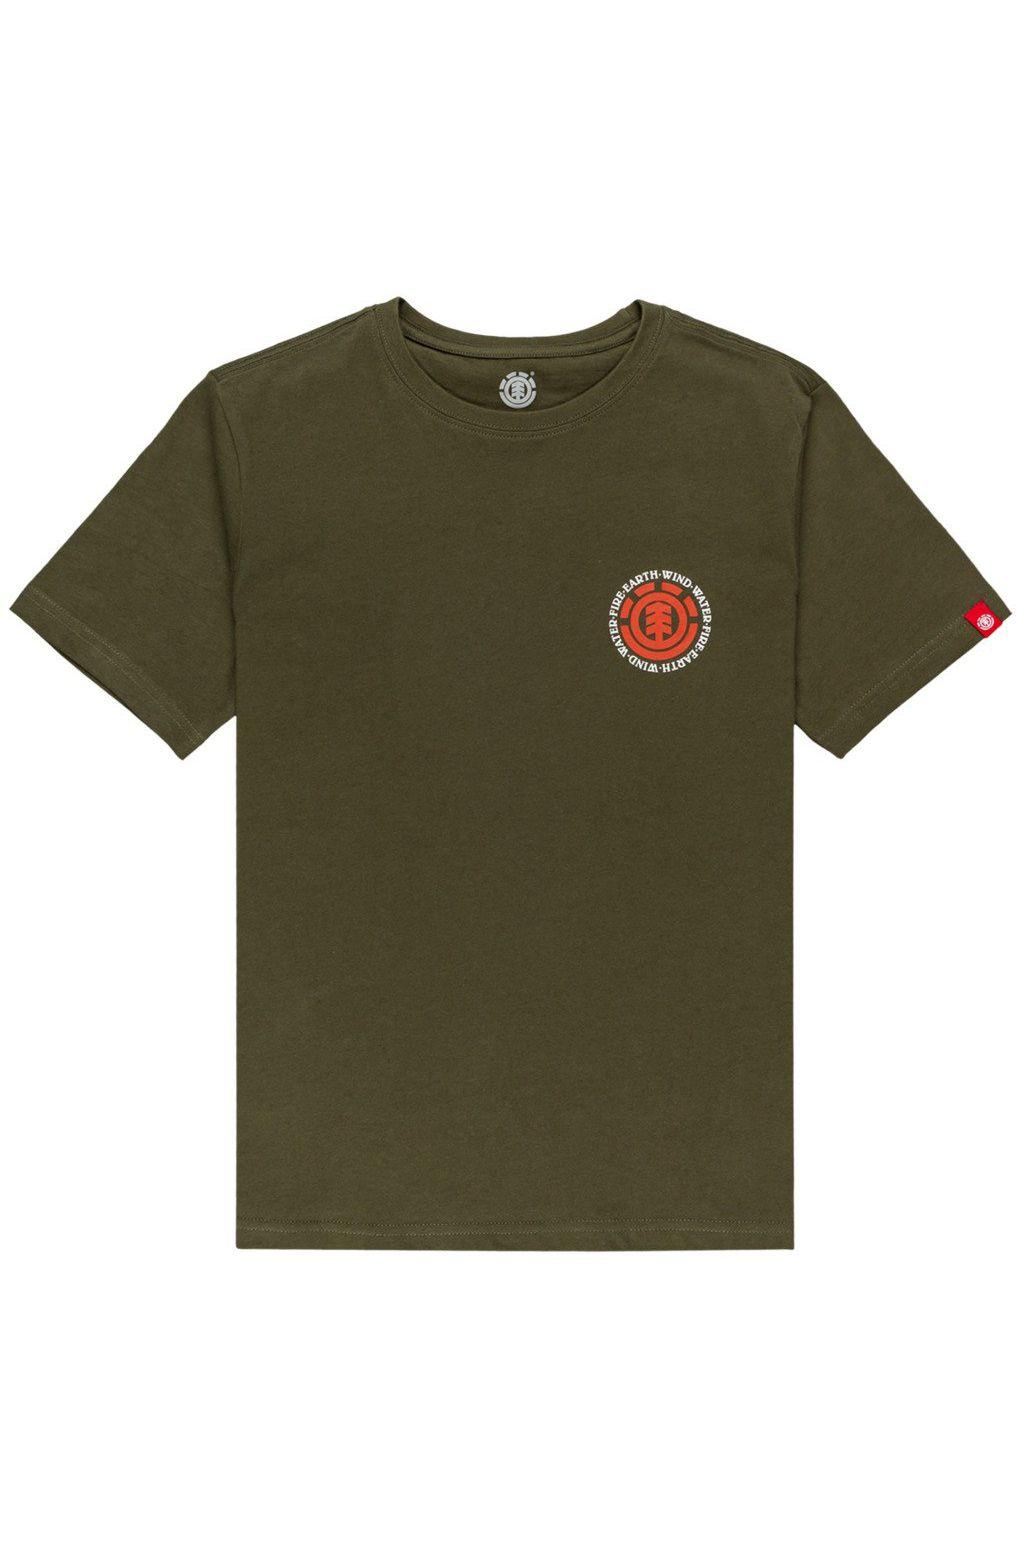 Element T-Shirt SEAL BP Army